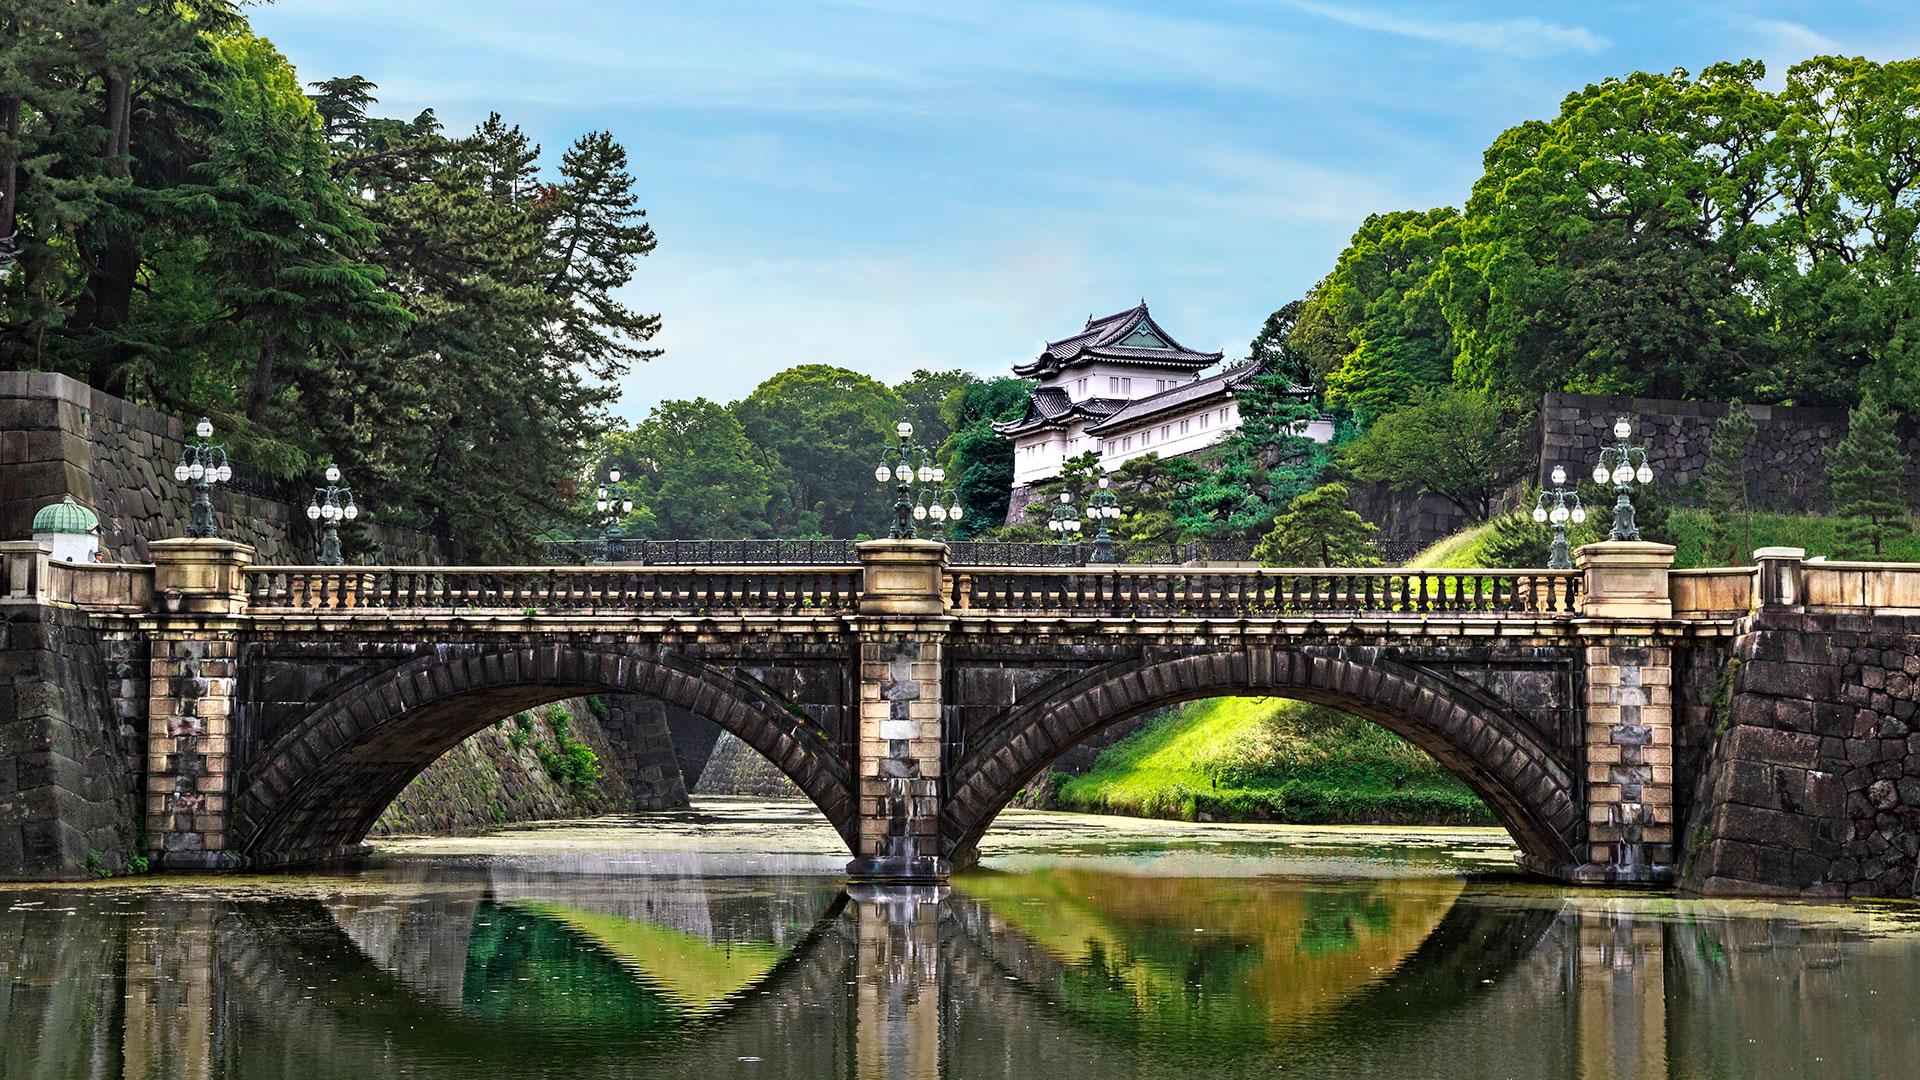 Imperial Palace and Nijubashi Bridge in Tokyo, Japan